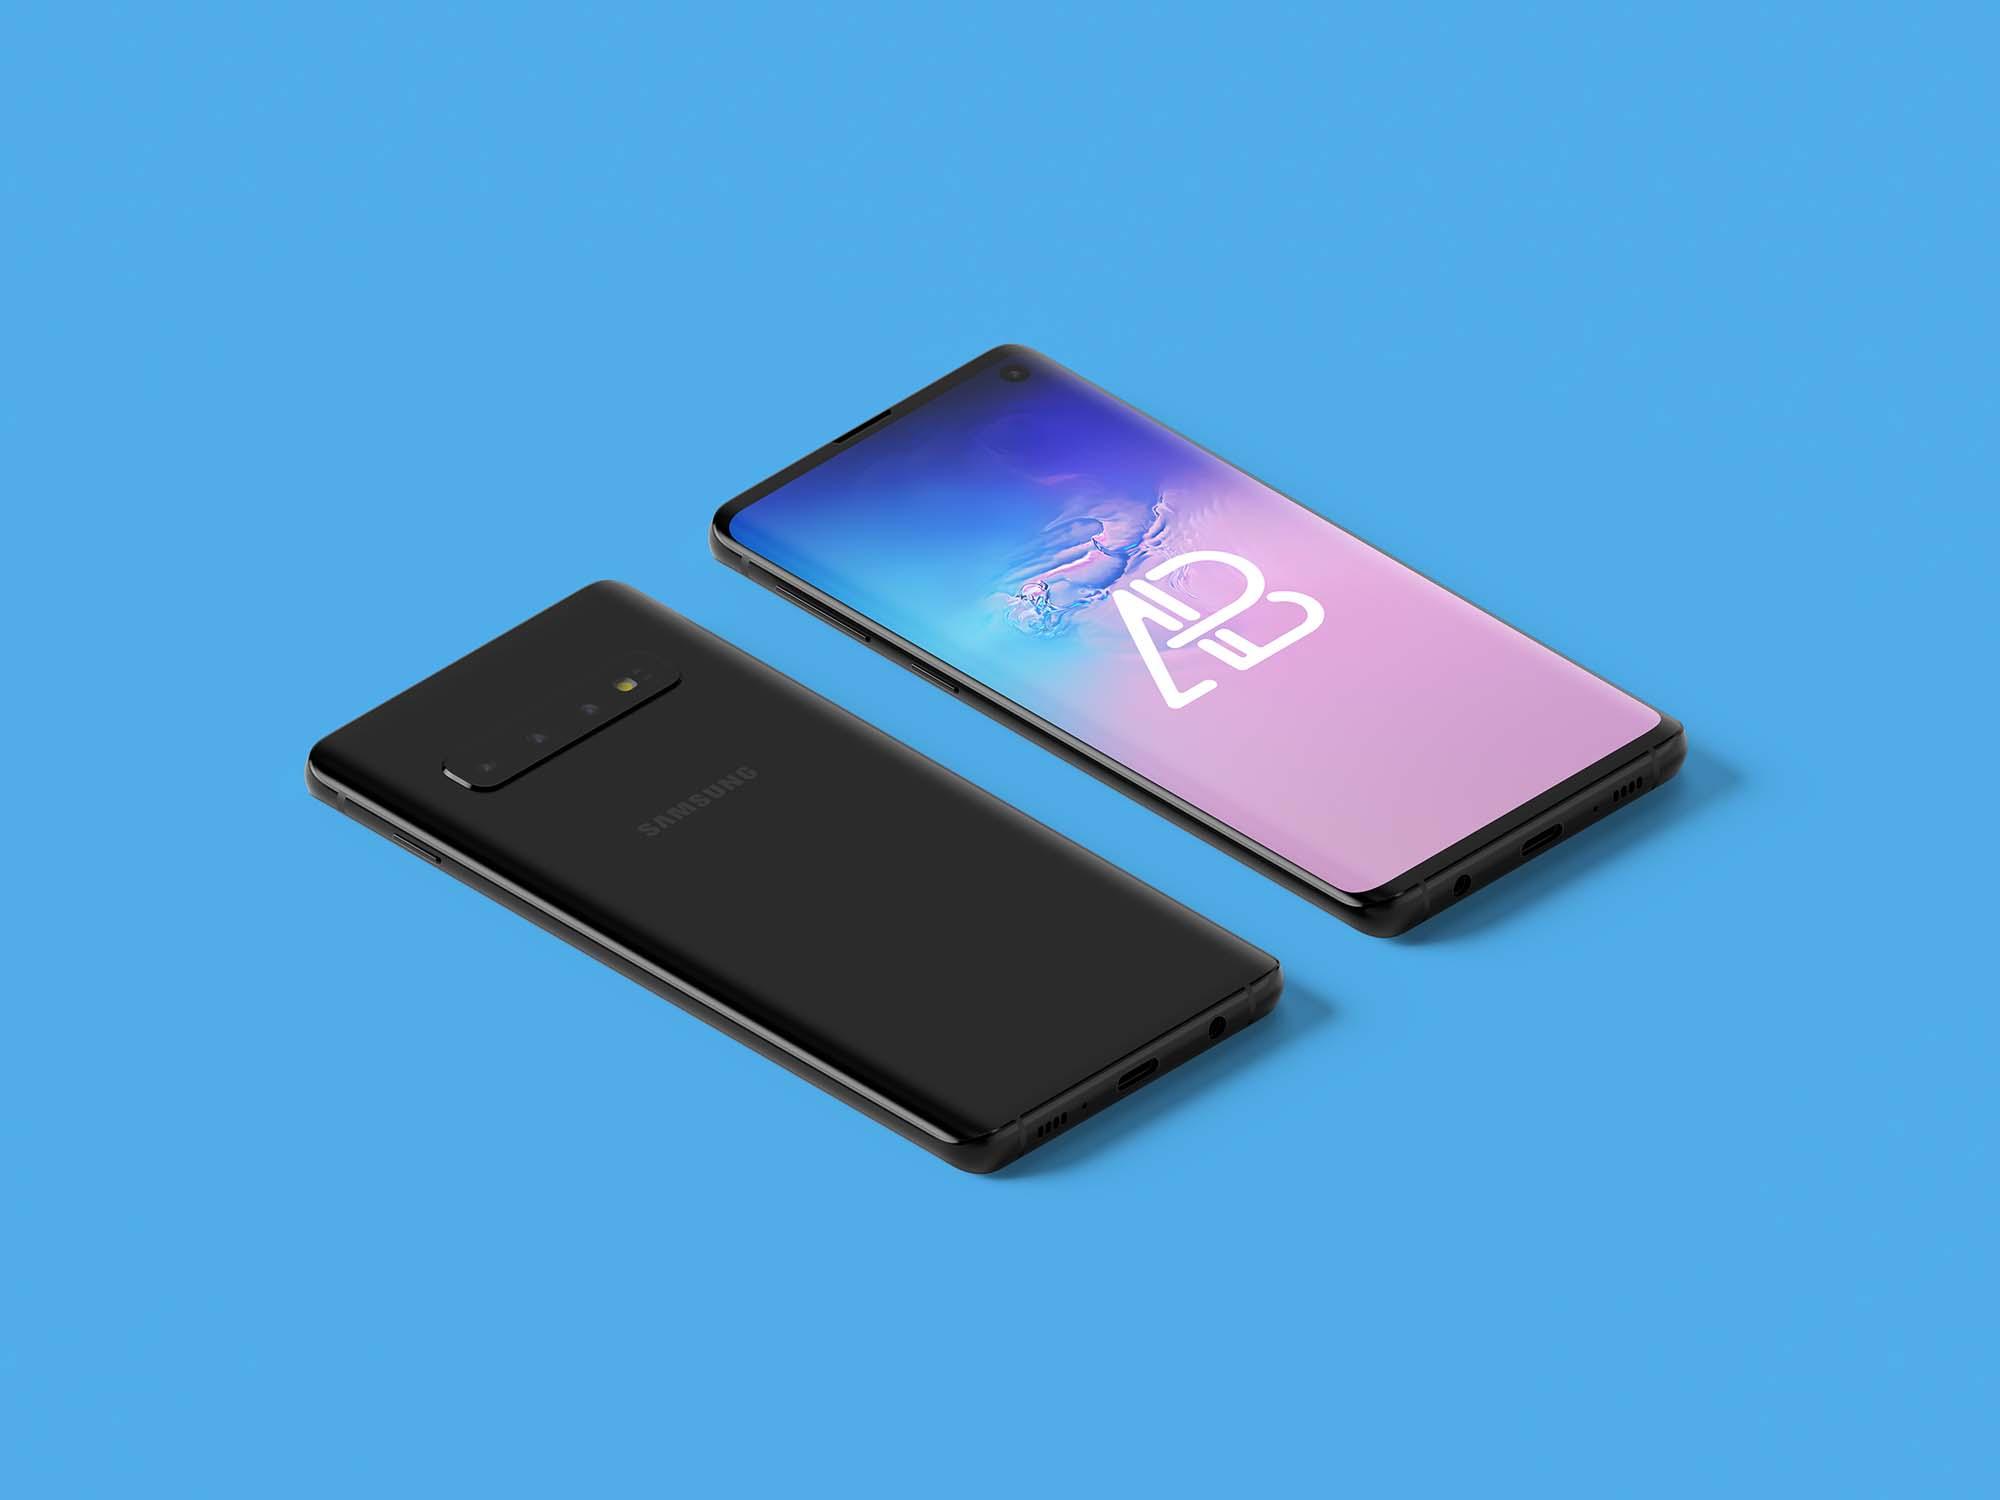 Samsung Galaxy S10 Isometric Mockup 2